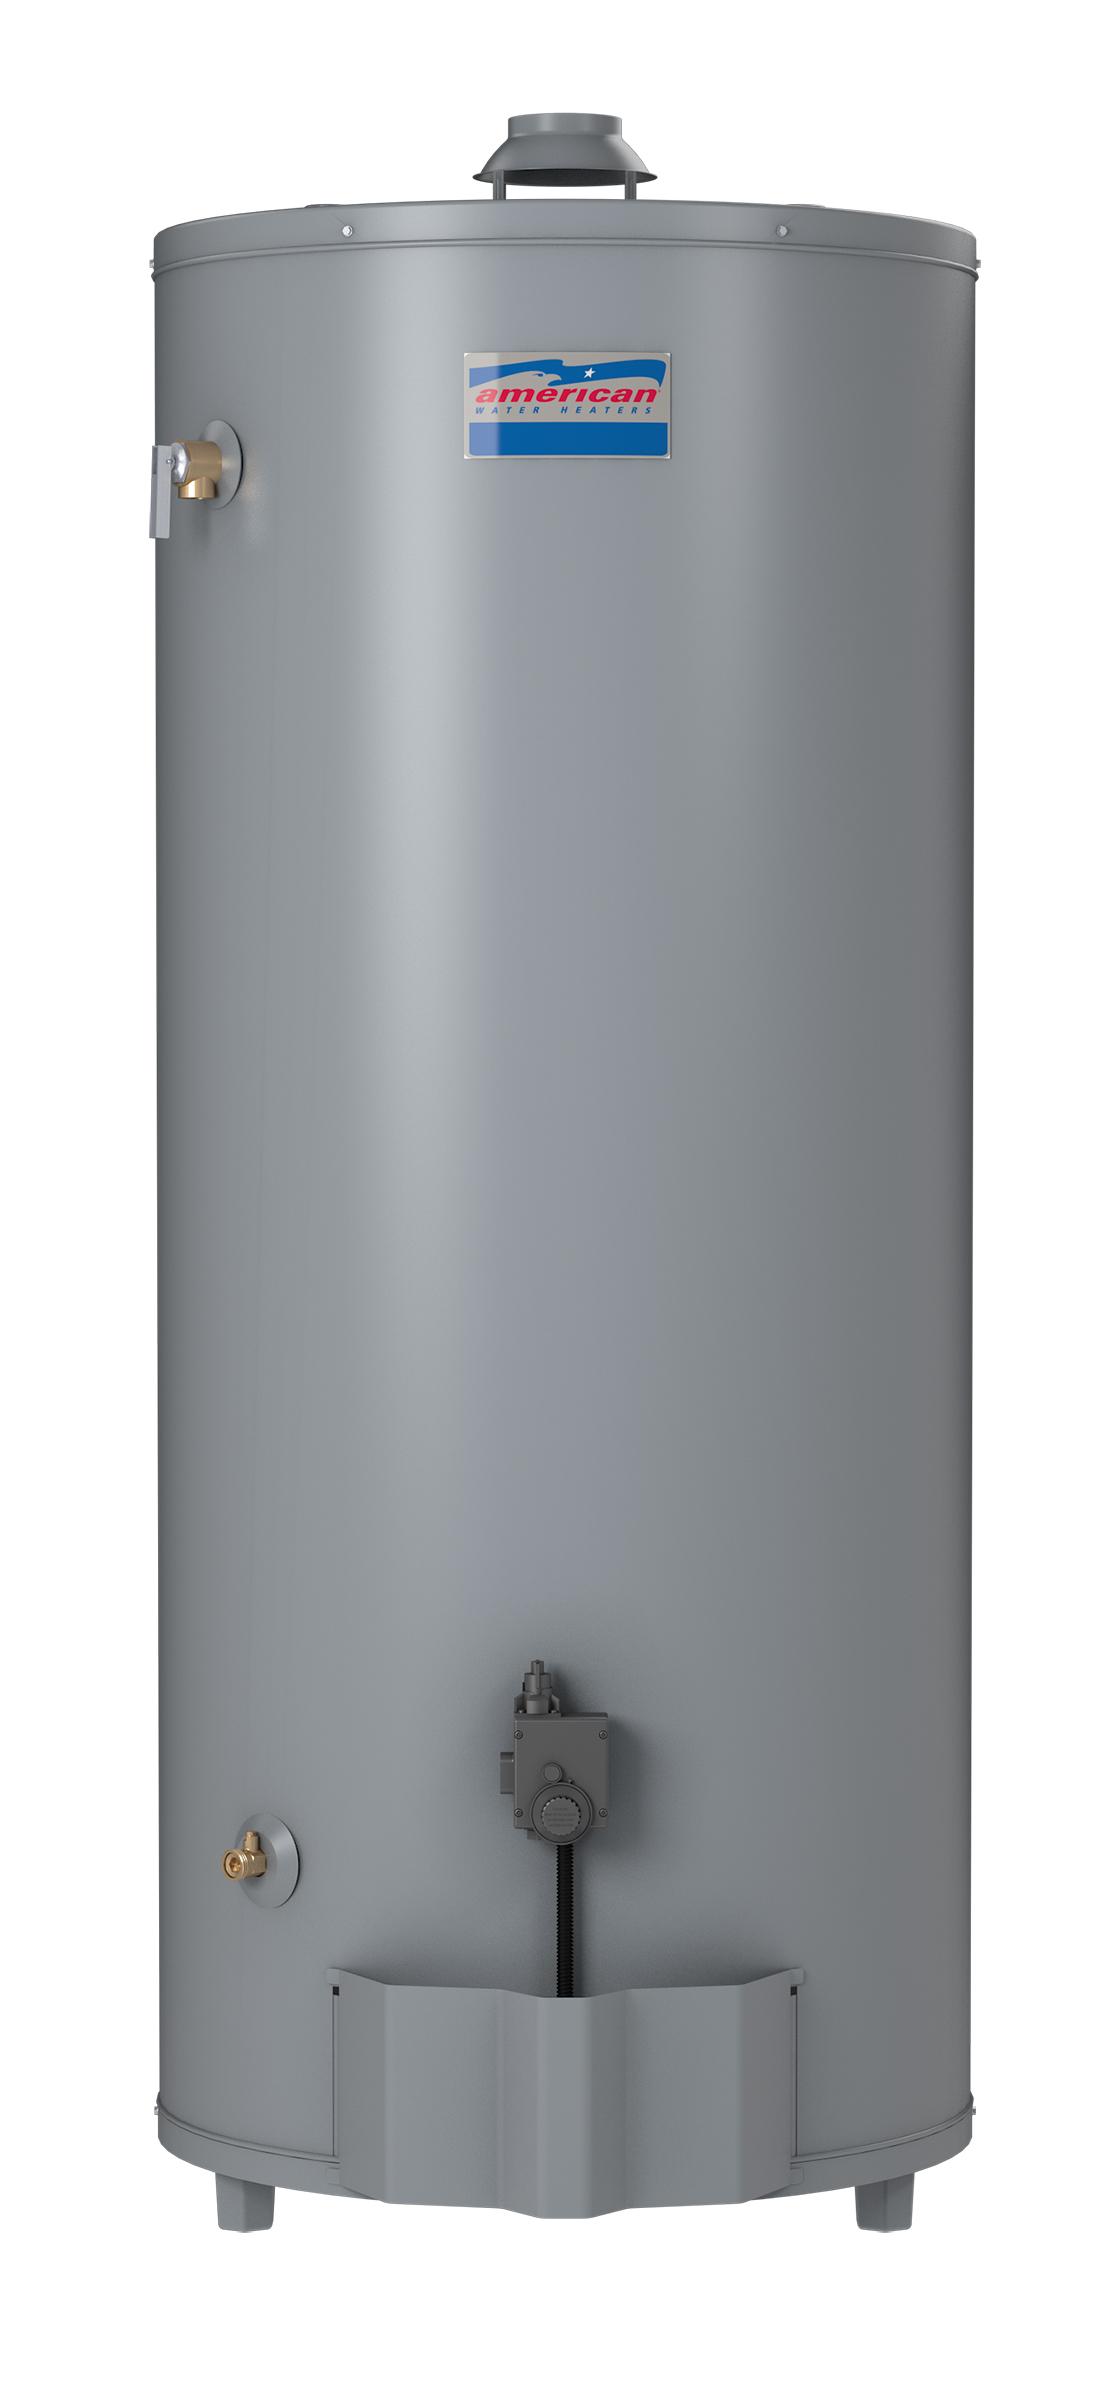 Whirlpool 50 Gallon Electric Water Heater Wiring Diagram 28 40 Washing Machine